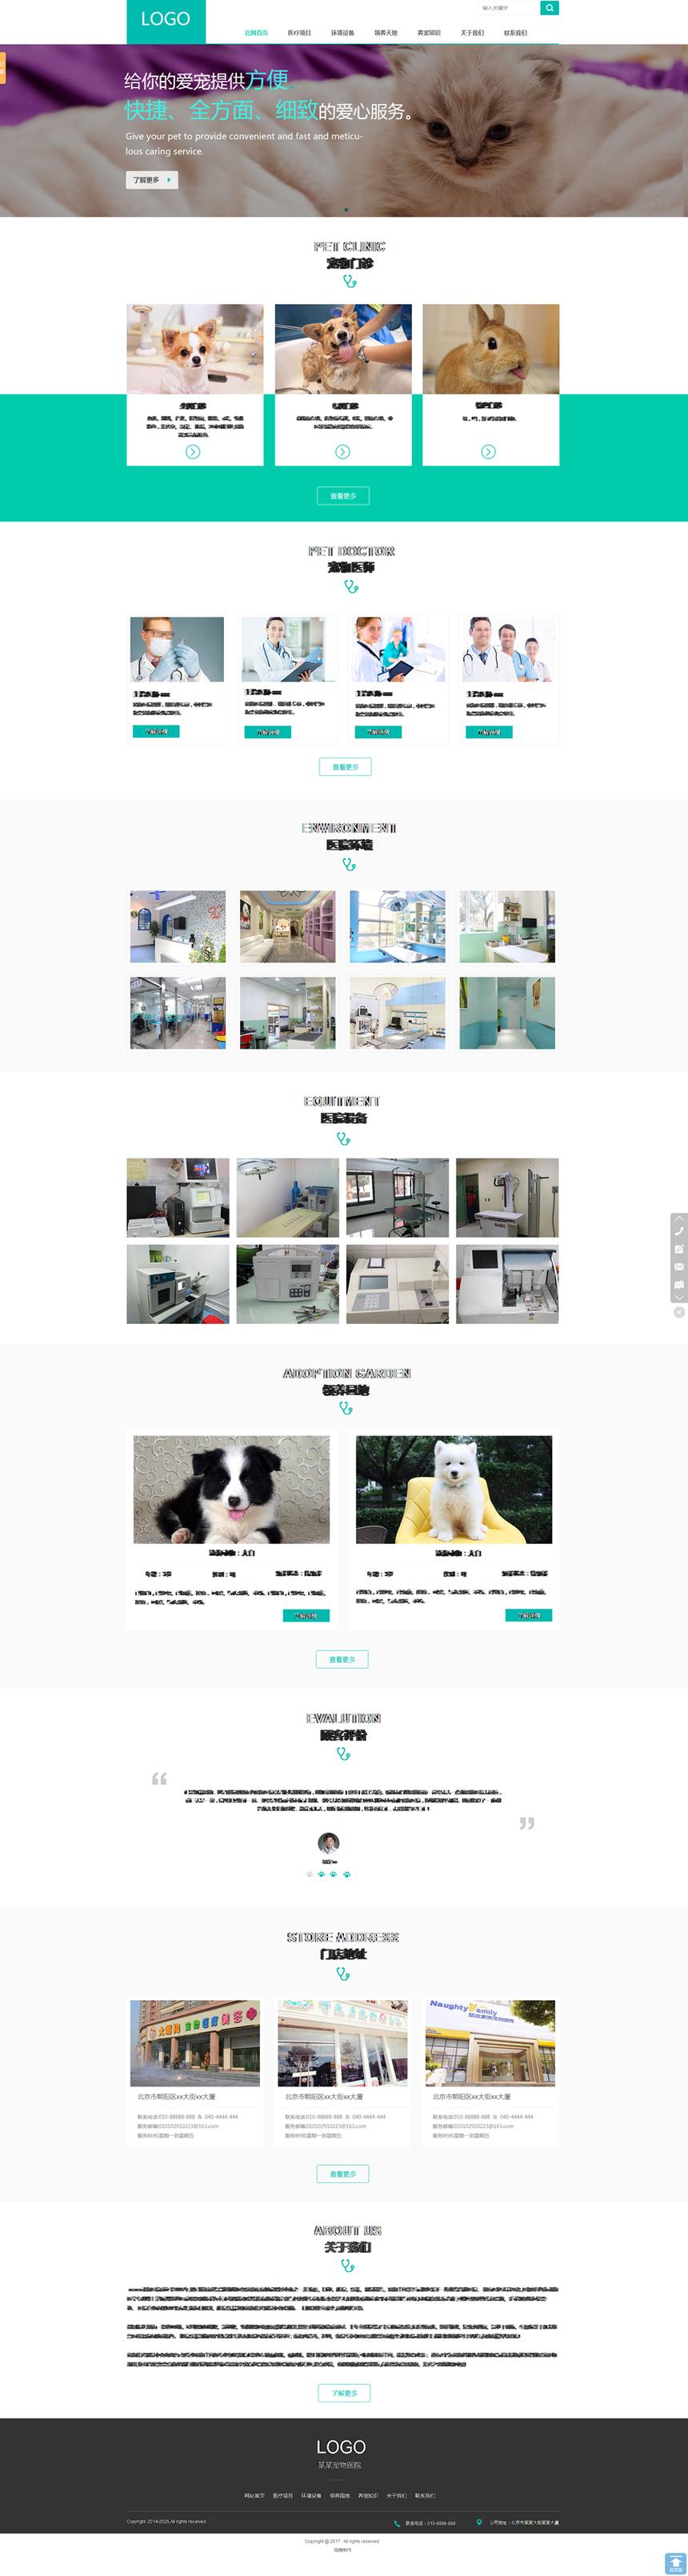 TJ_949 宠物网站建设.png